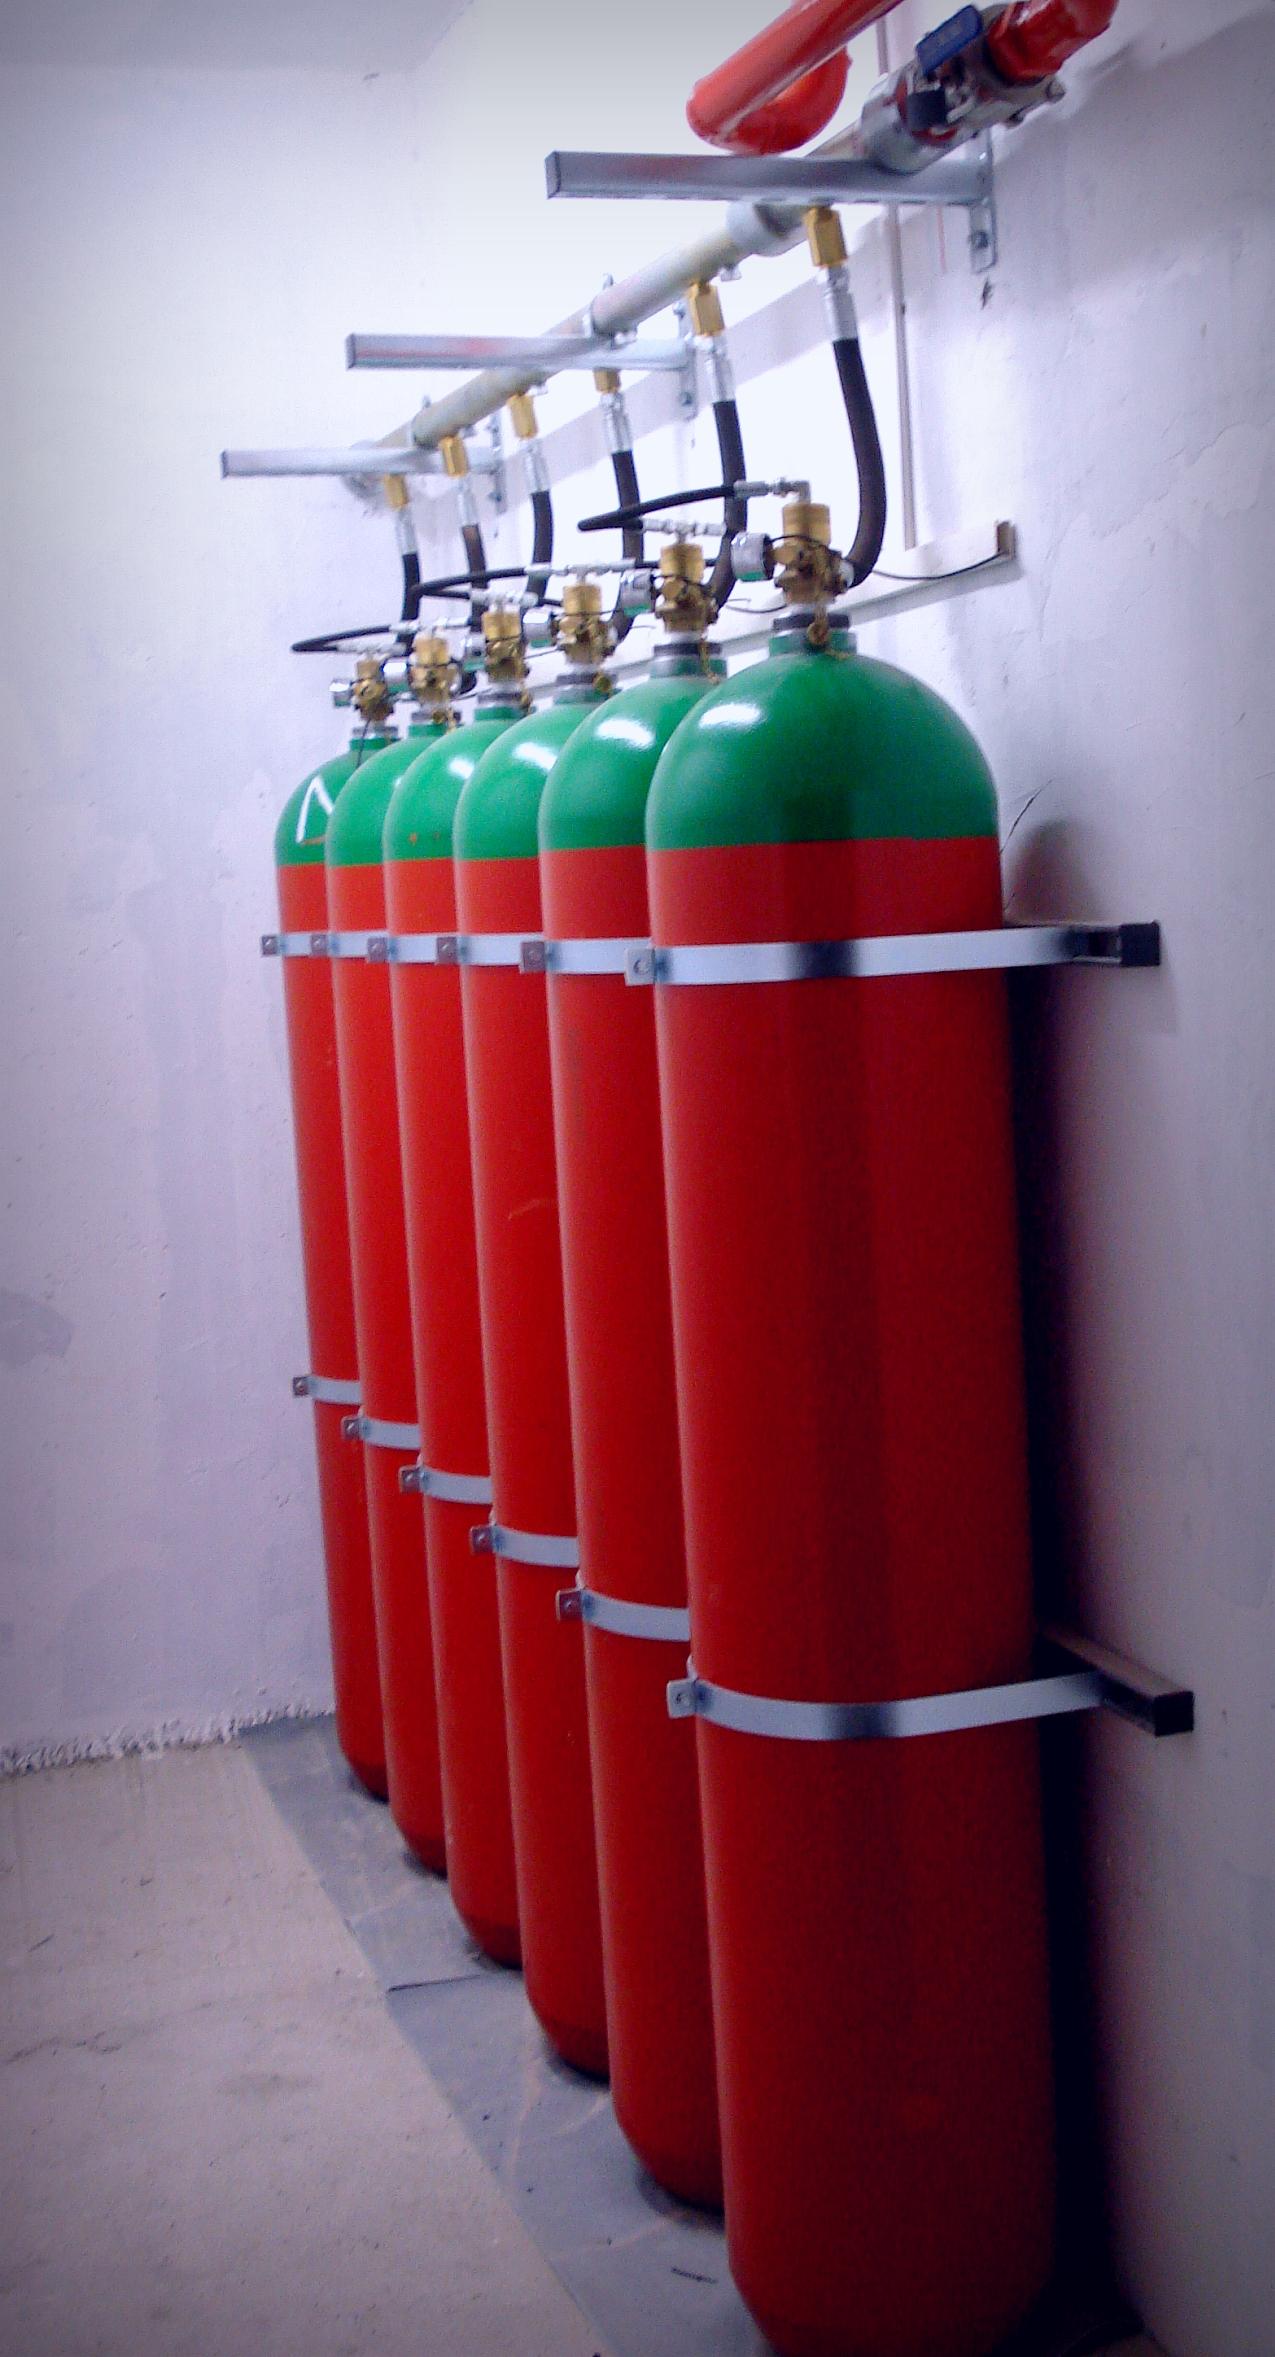 СО2 Fire Suppression Systems